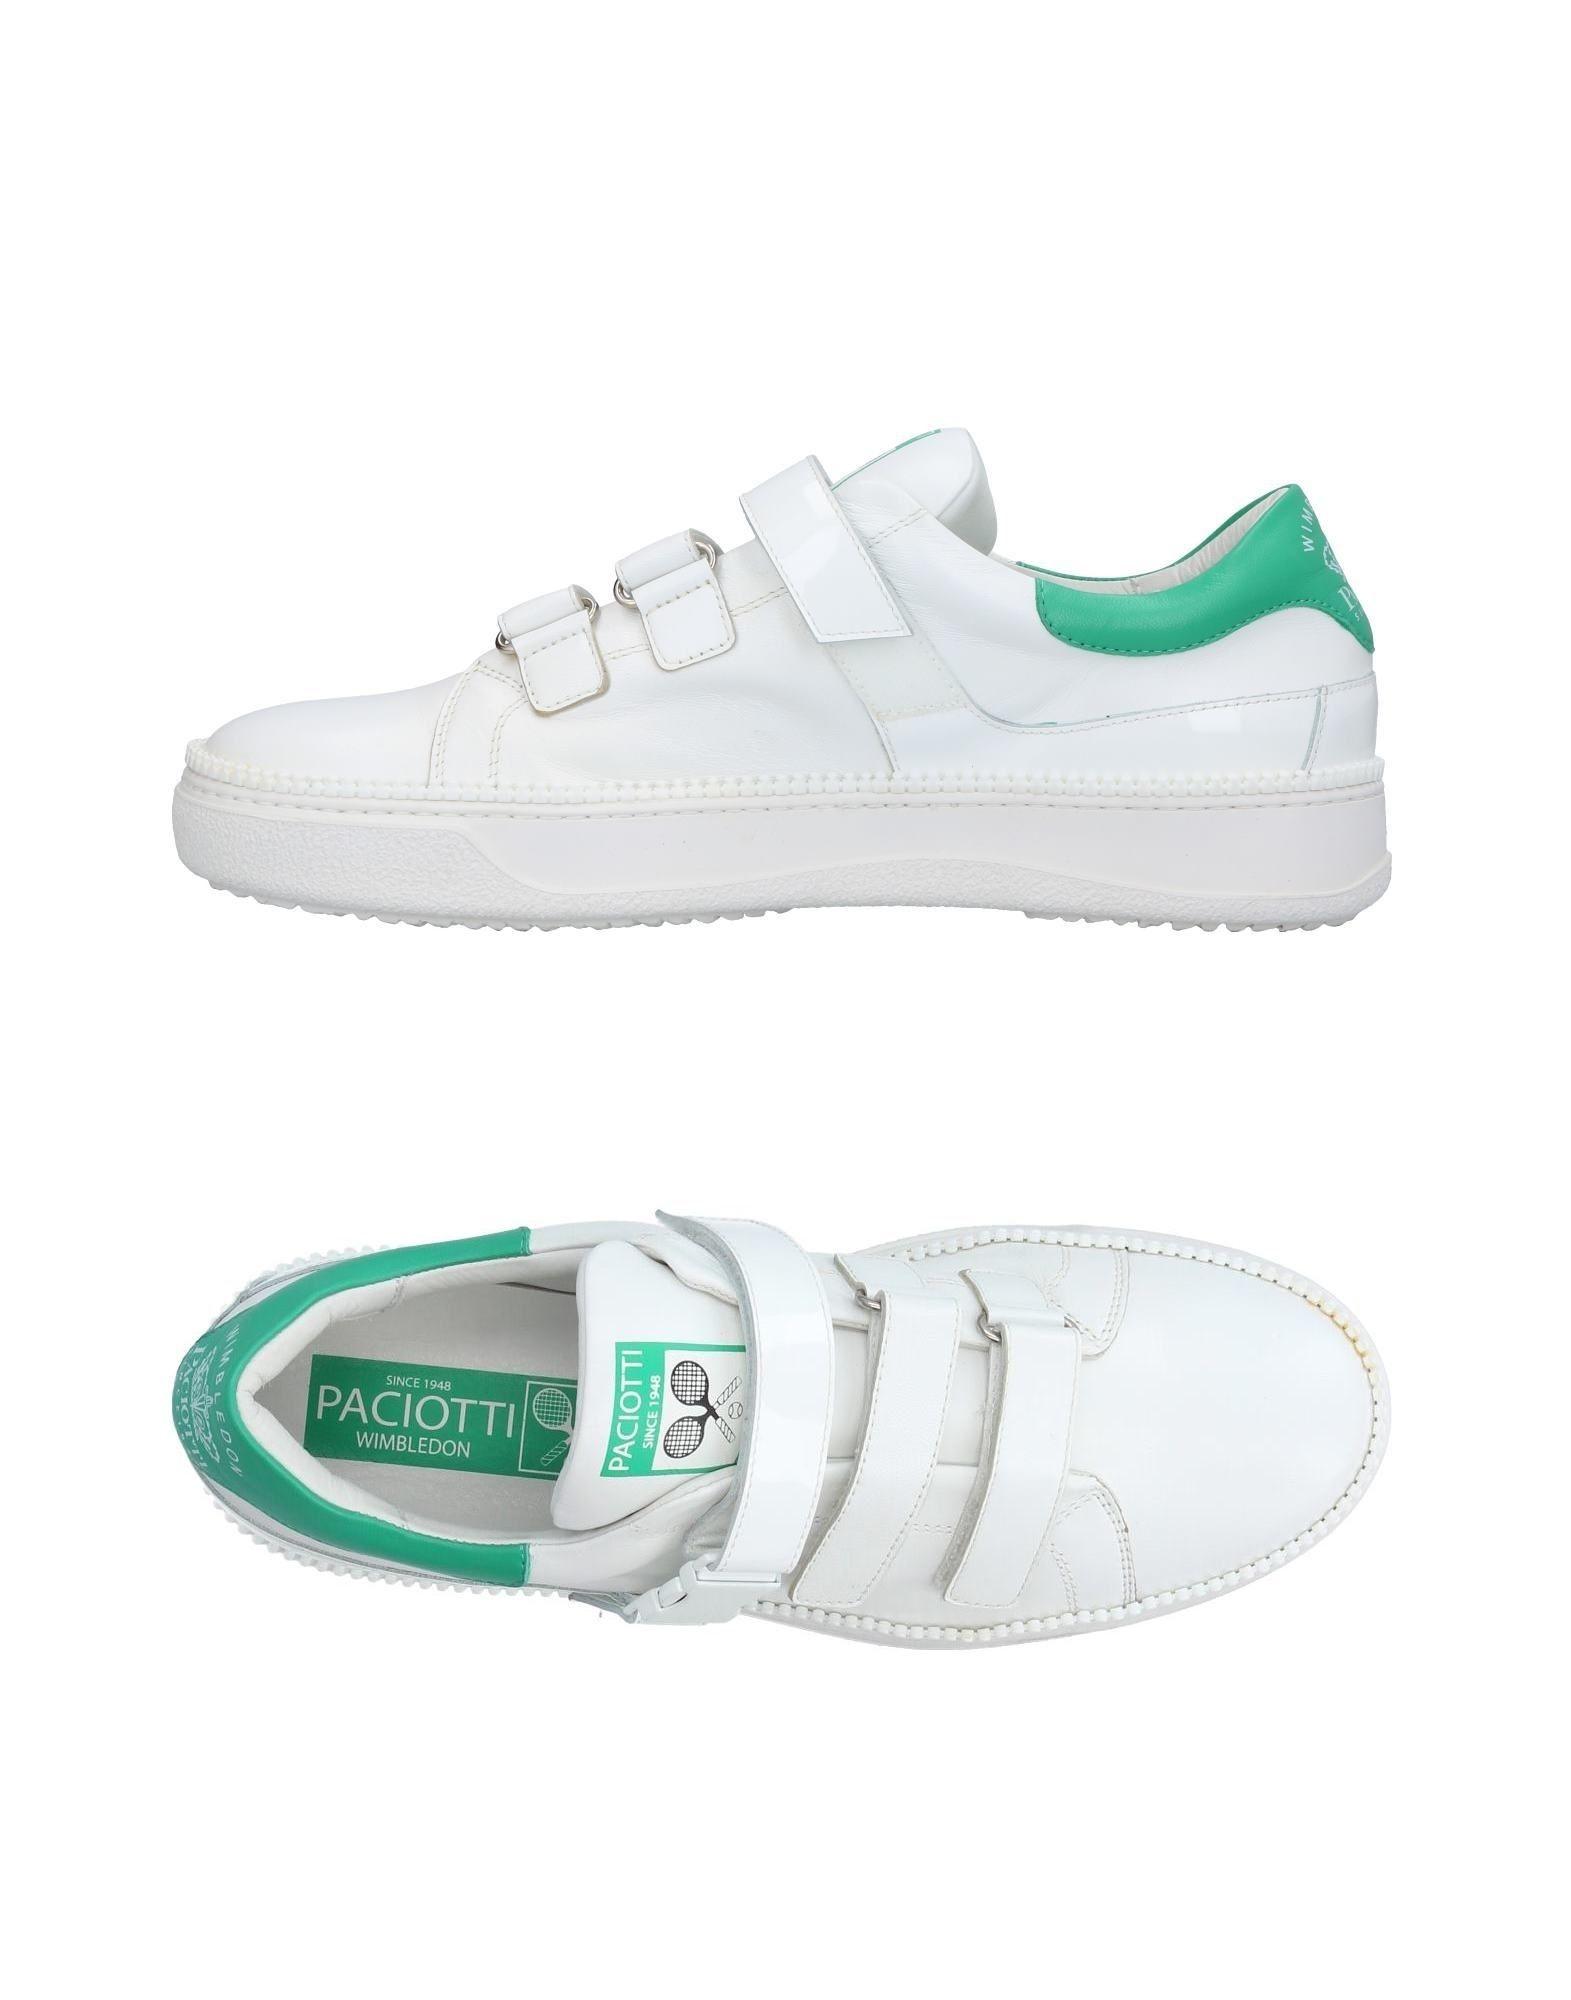 Cesare Paciotti Sneakers Herren  11387147KQ Gute Qualität beliebte Schuhe